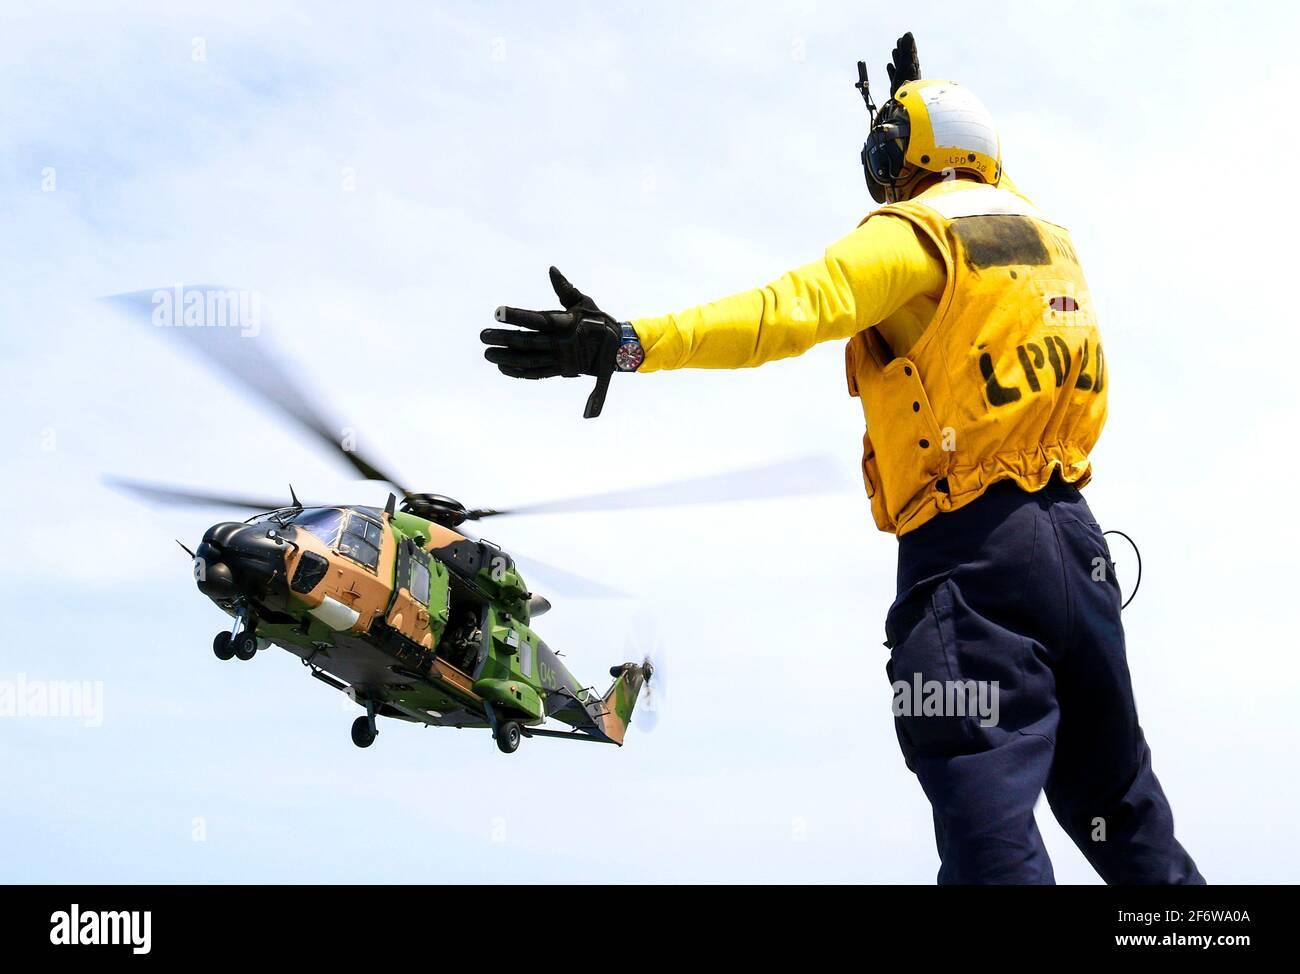 CORAL SEA (Nov 19, 2018) Aviation Boatswainâ.s Mate (Manipulación) Airman Caleb Brawner, de Wichita, Kan. , señala un helicóptero Taipan MRH-90 Foto de stock